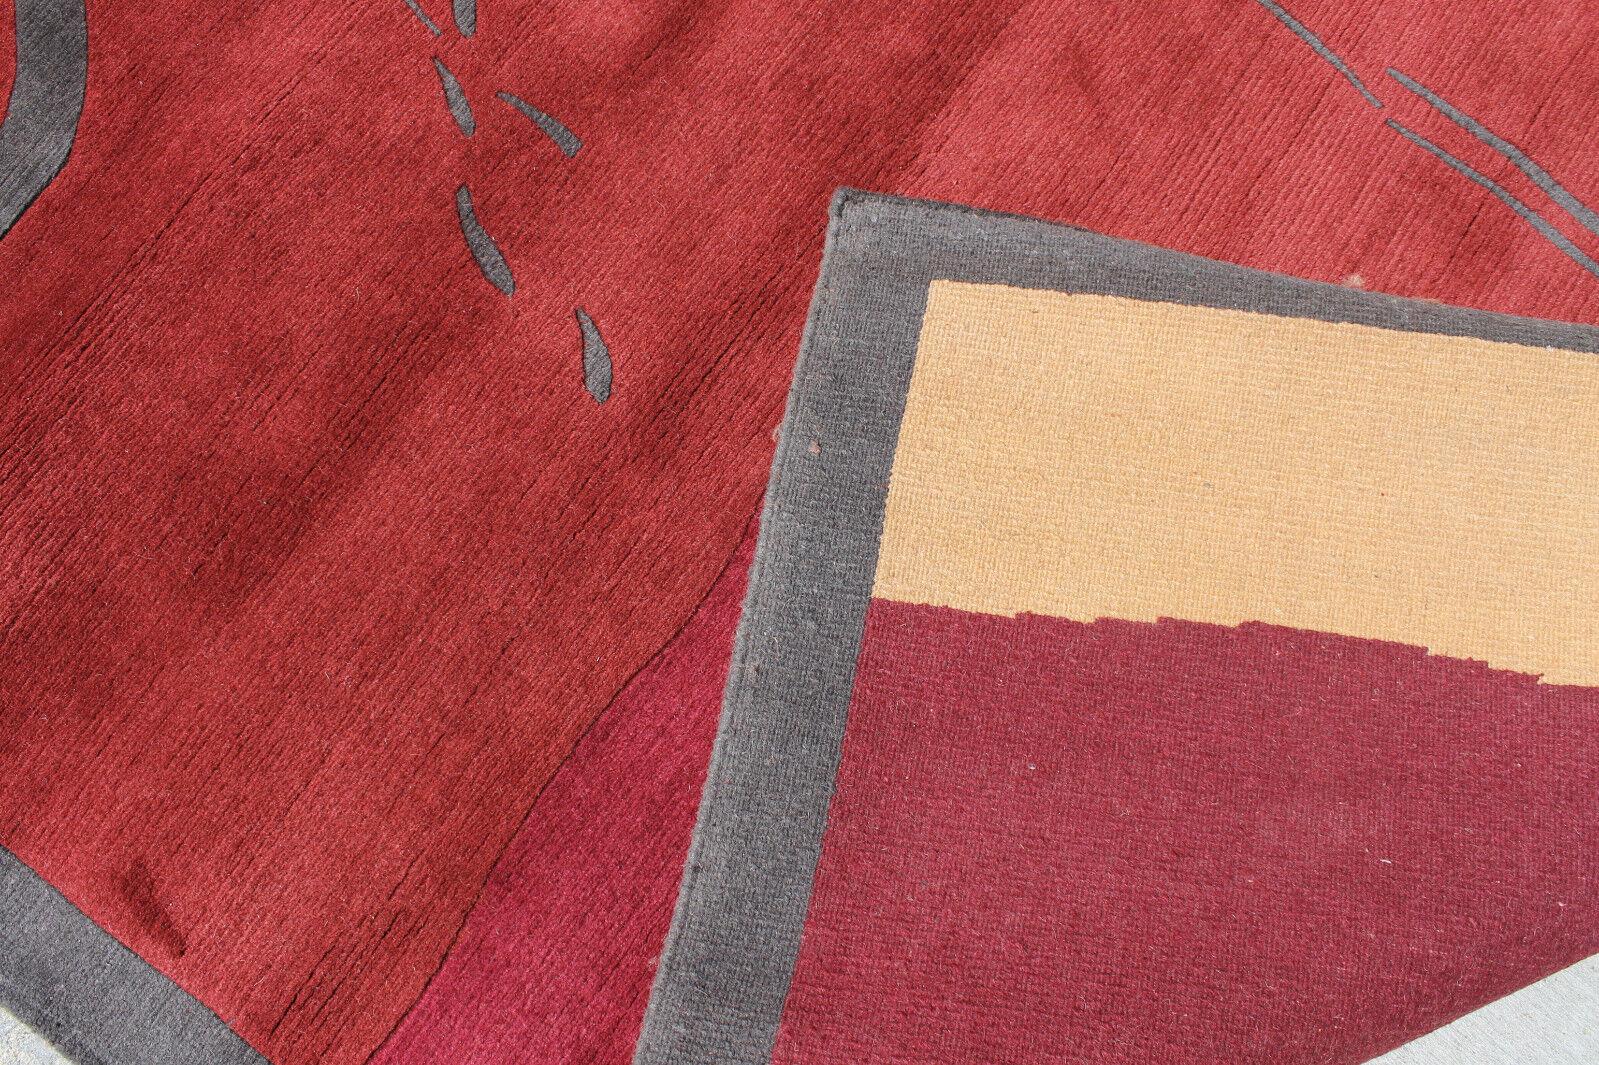 RSG1754 Gorgeous Contemporary Tibetan Woolen Area Rug 8' x x x 10' Made in Nepal 1fd690